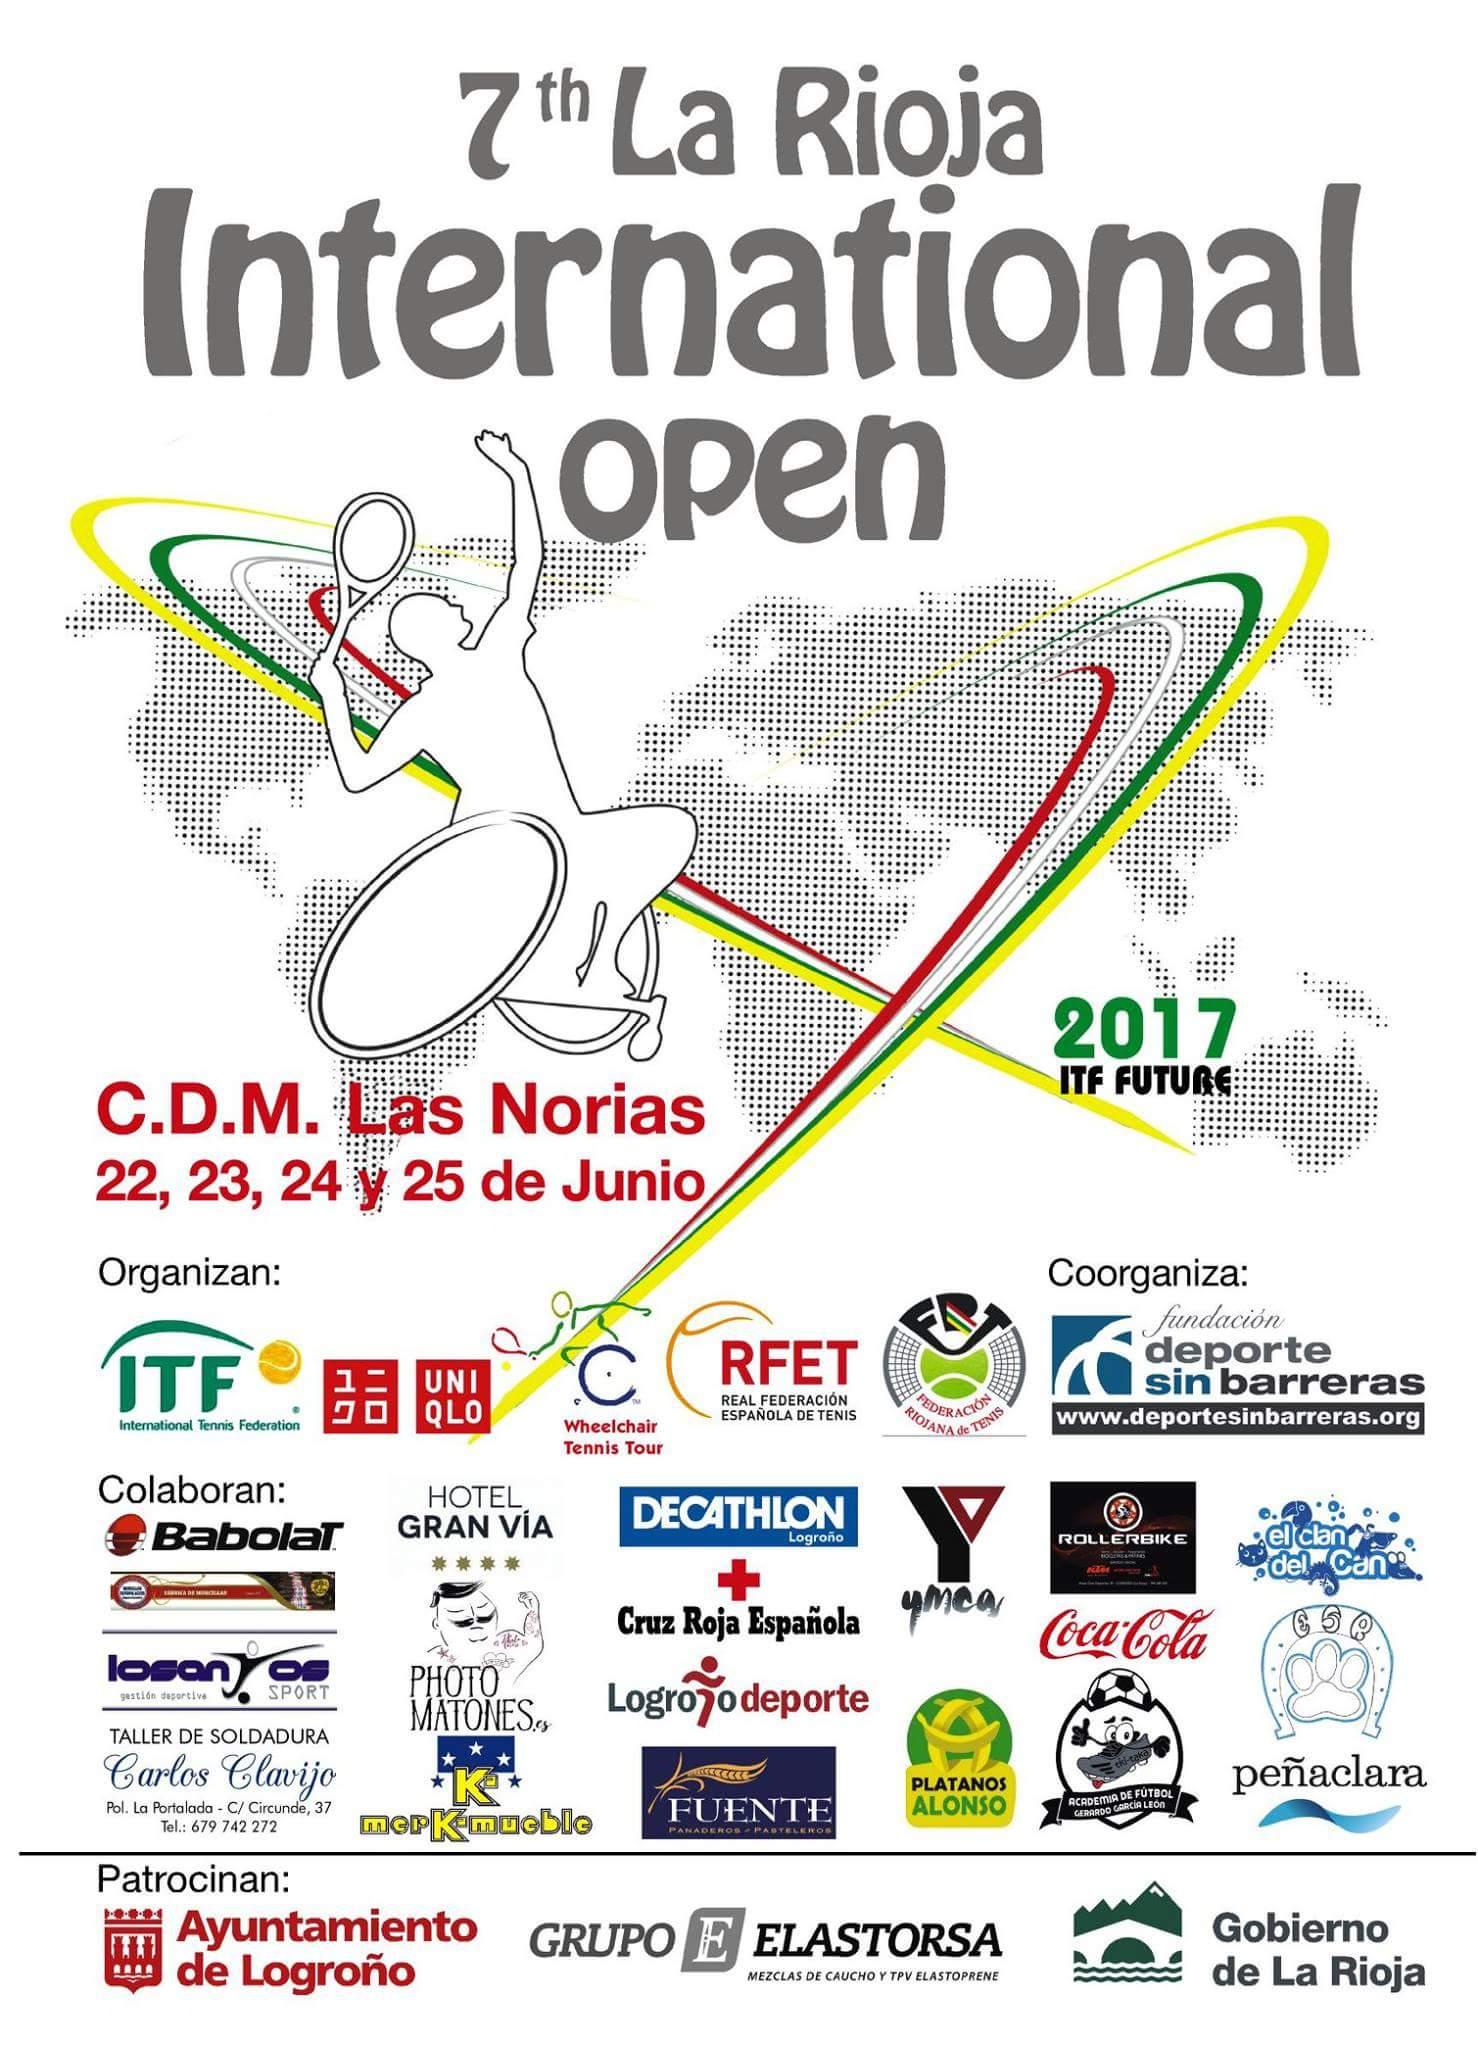 7 LA RIOJA INTERNATIONAL OPEN